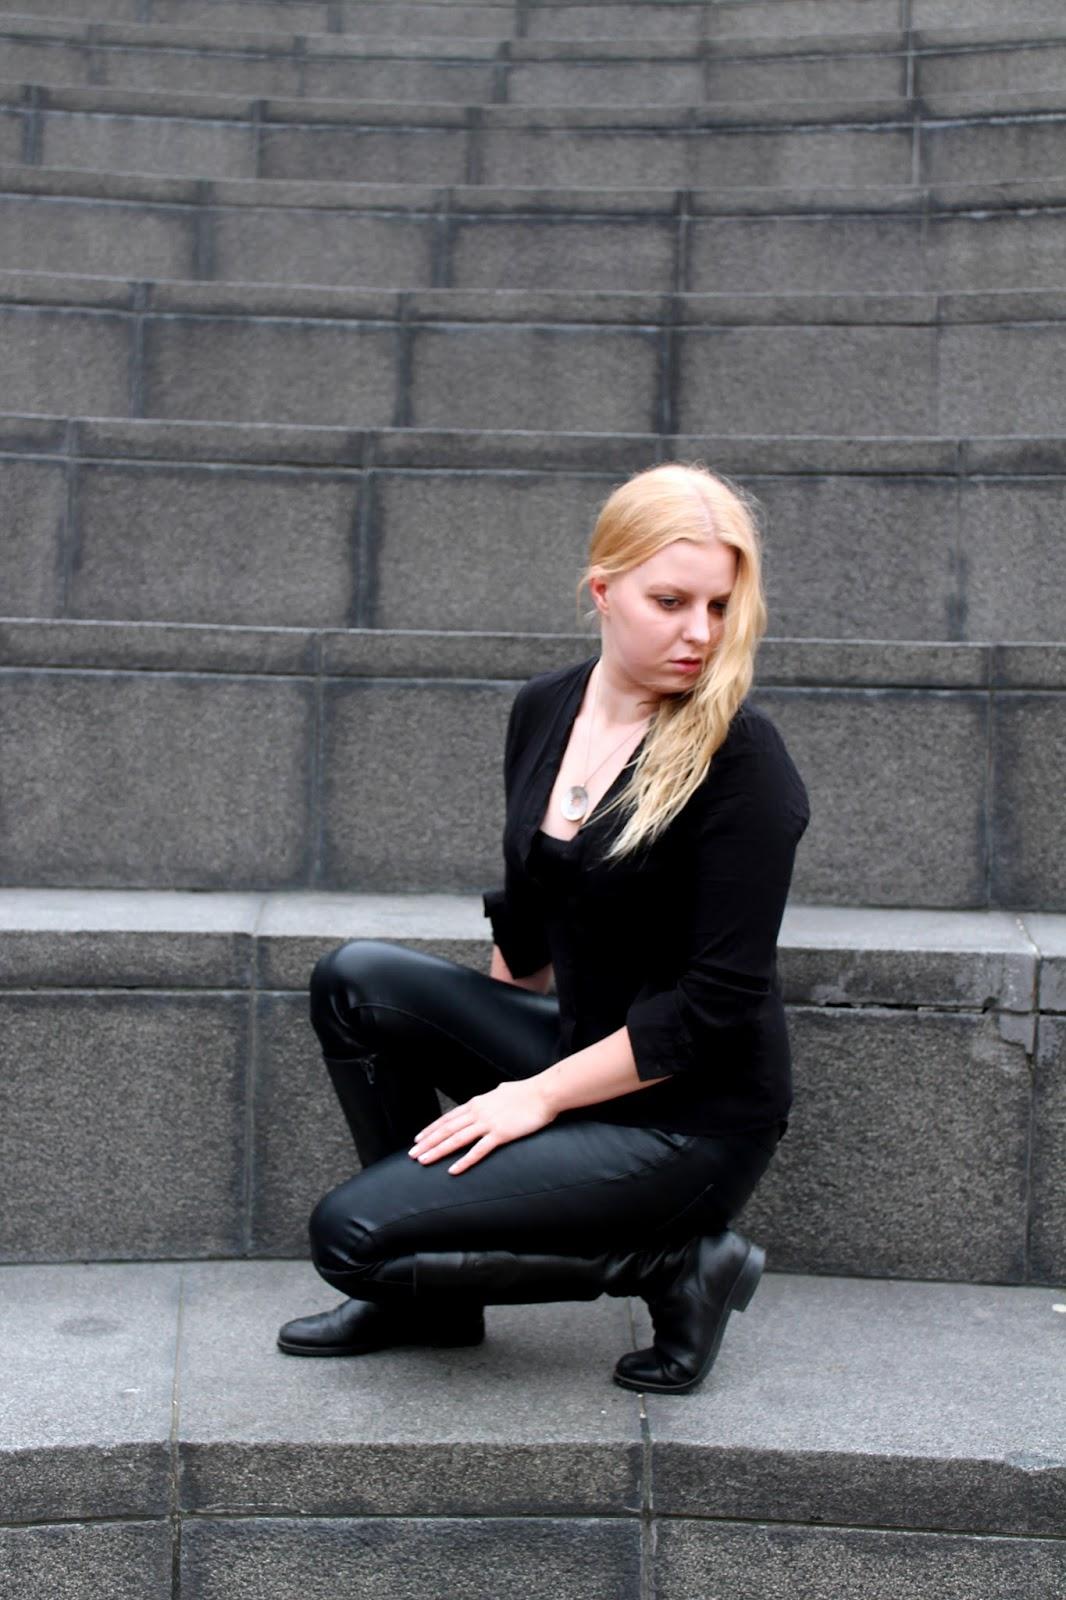 tiger of sweden, boots, ootd, outfit, asu, nahkahousut, leather, pants, vero moda, nails, hair, blonde, hiukset, kynnet, koru, silkki, nahka, musta, black, all, ampfitheathre